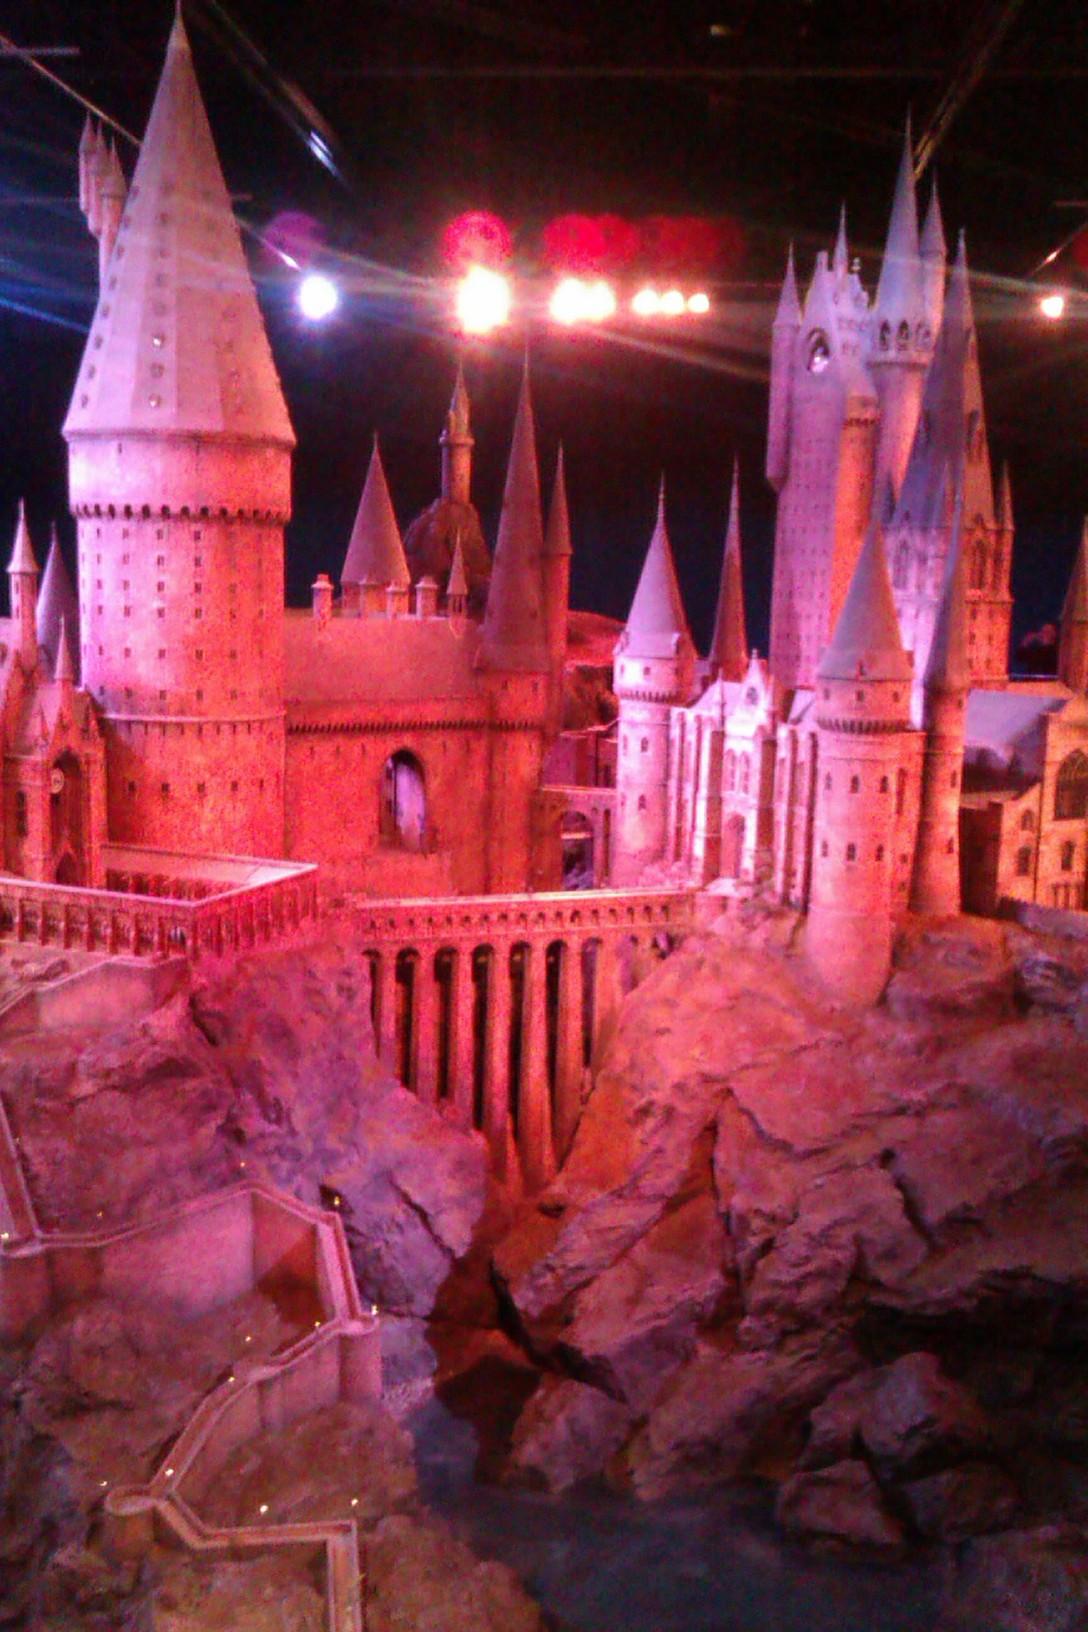 Model of Hogwarts